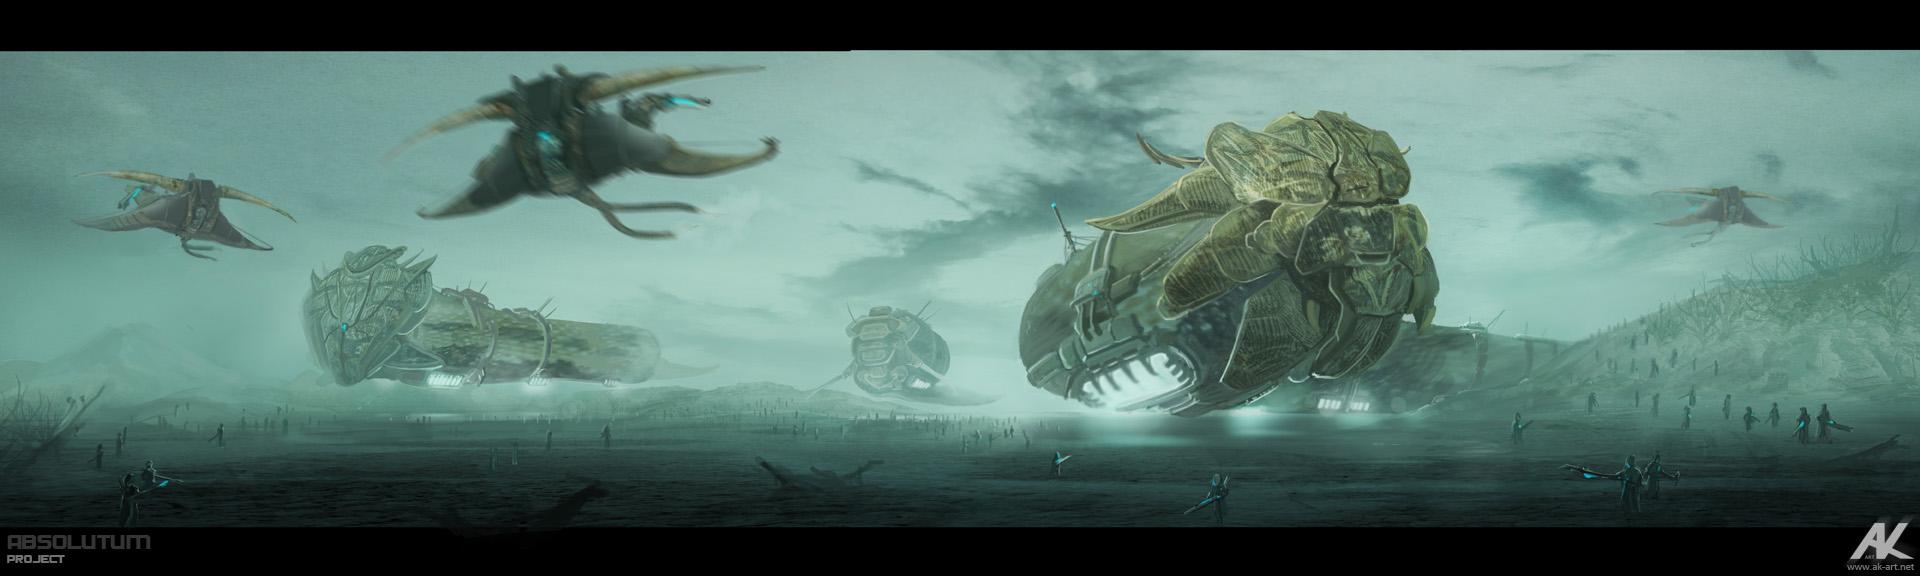 Absolutum - nomadic army by adamkuczek